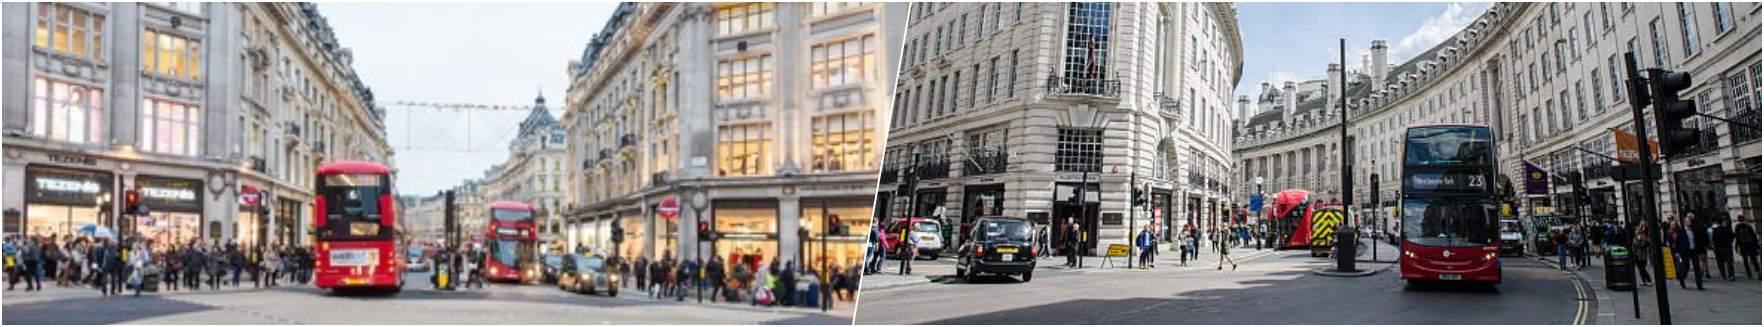 Oxford Street_Regent Street